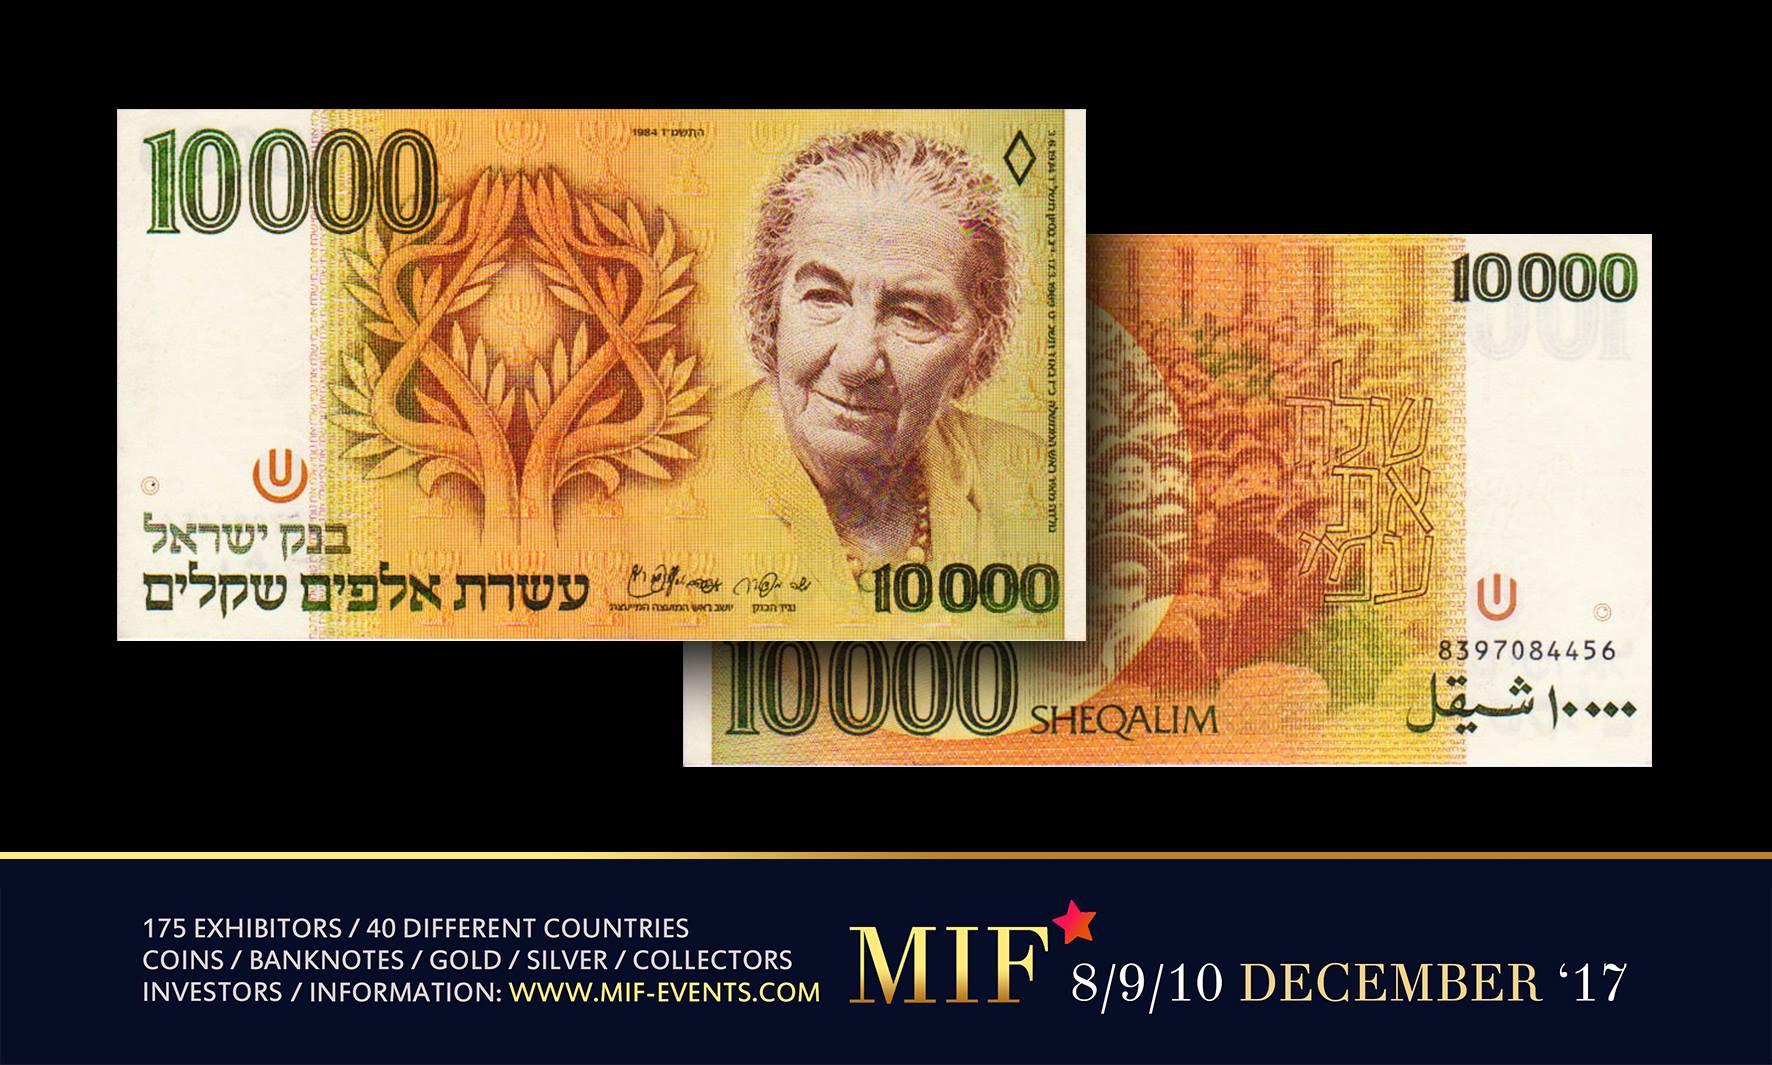 History Of The Israeli Shekel